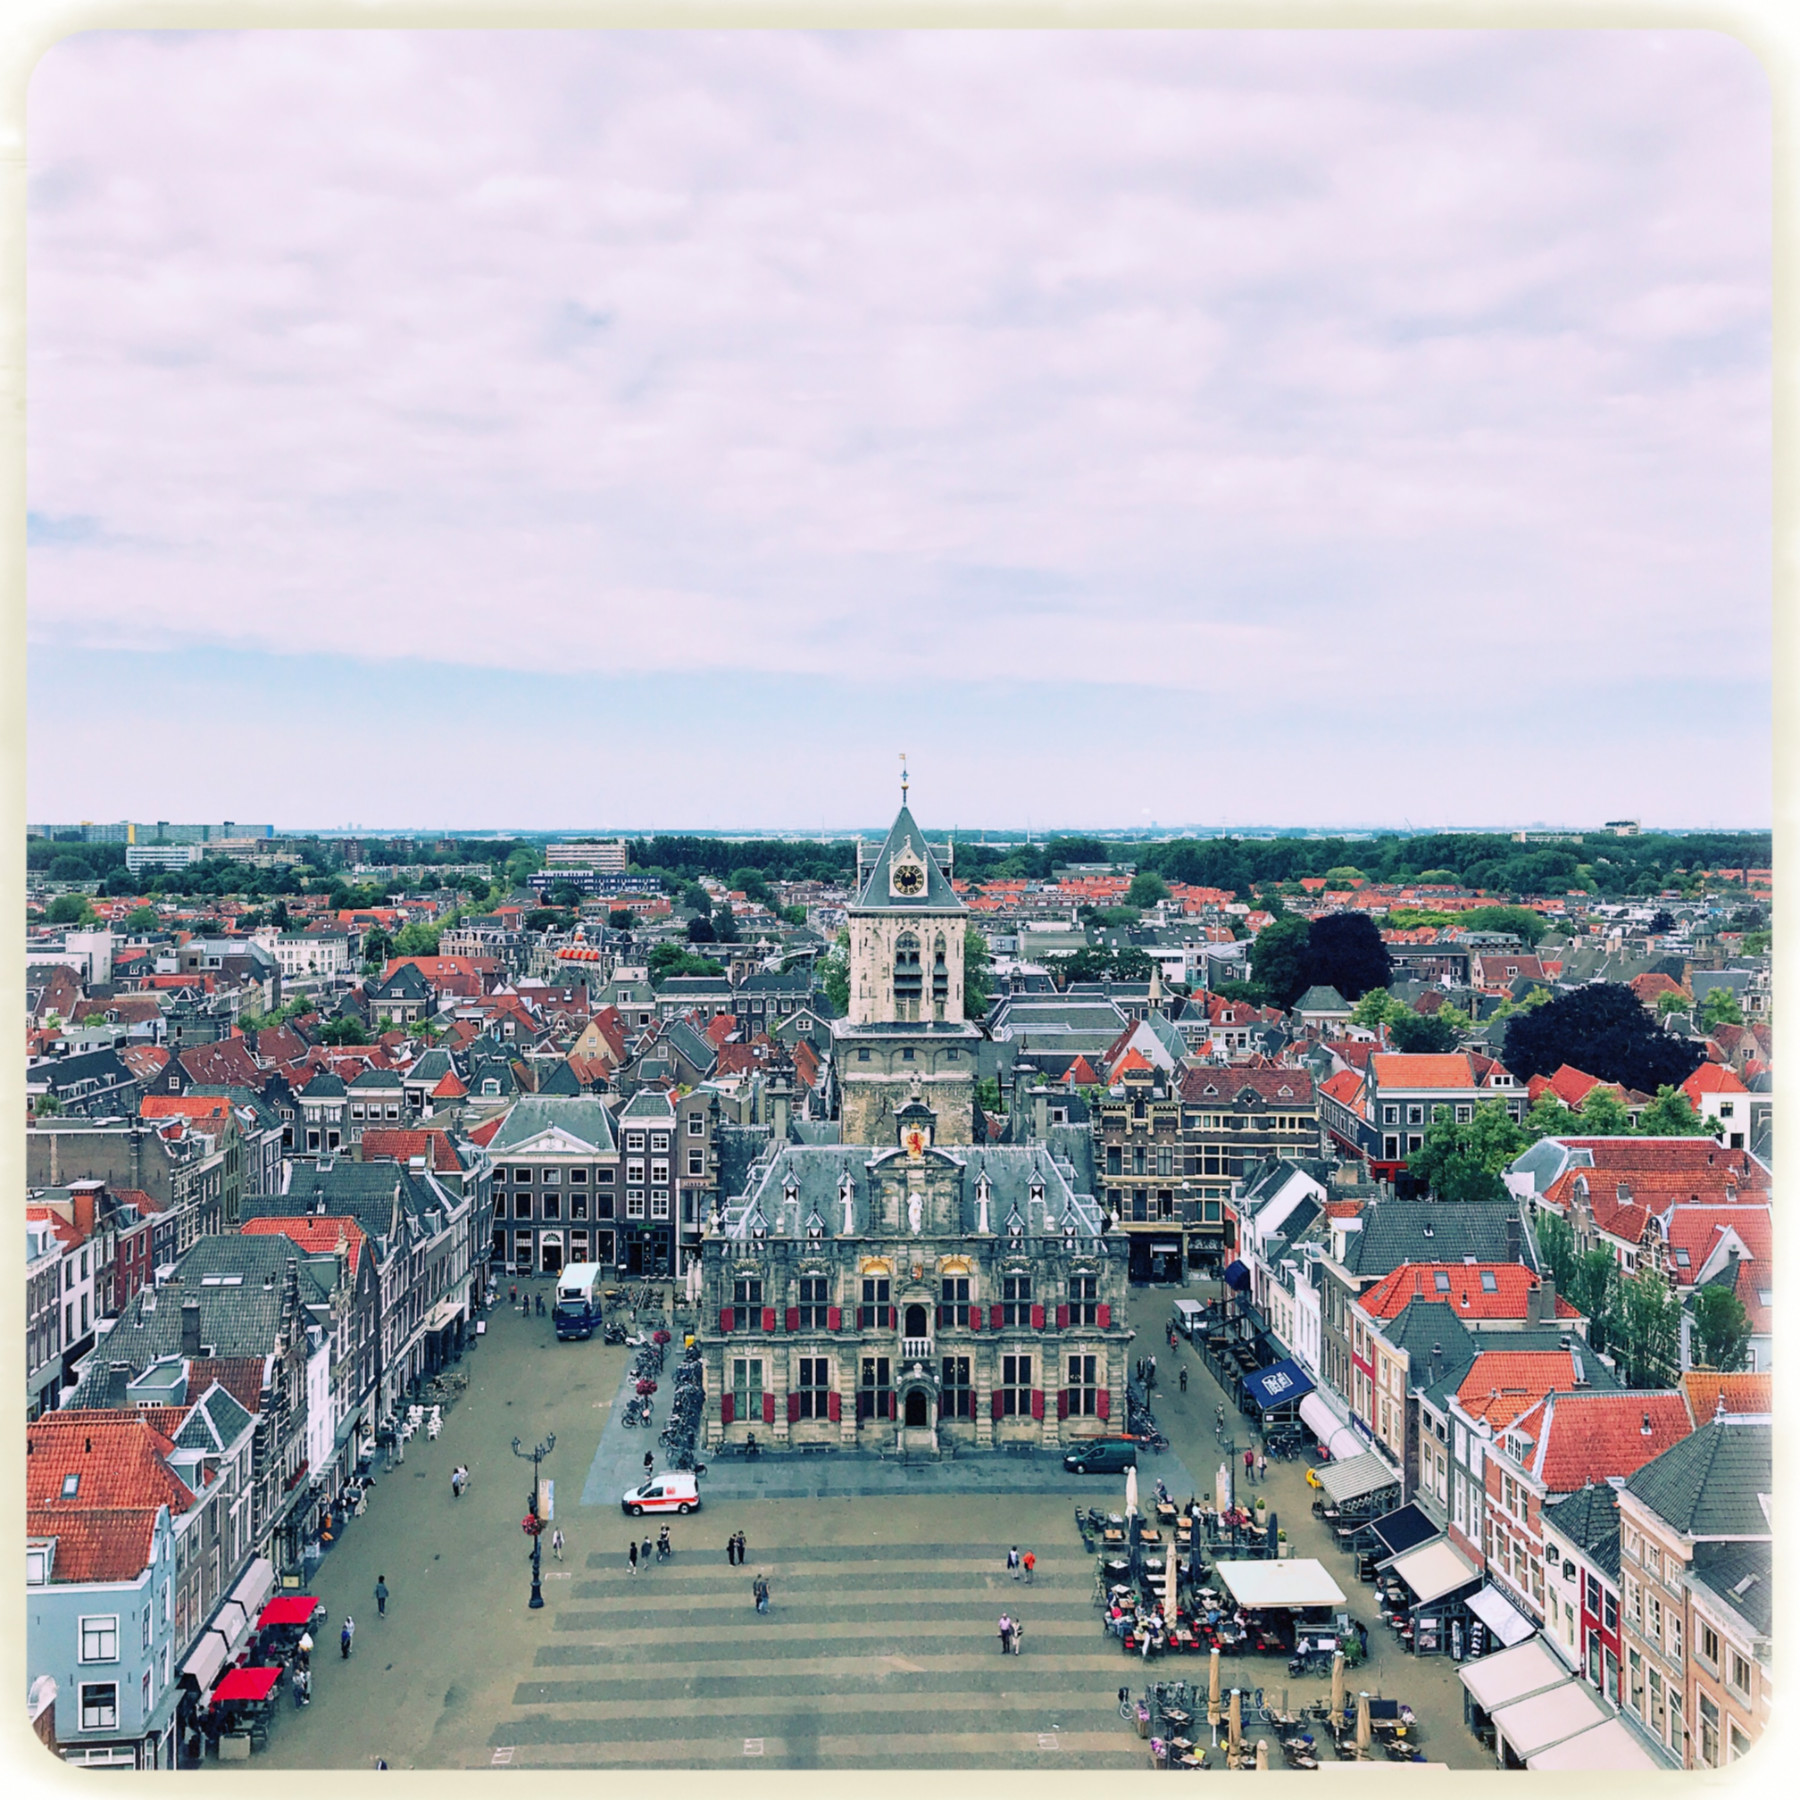 048-Nederland-Delft